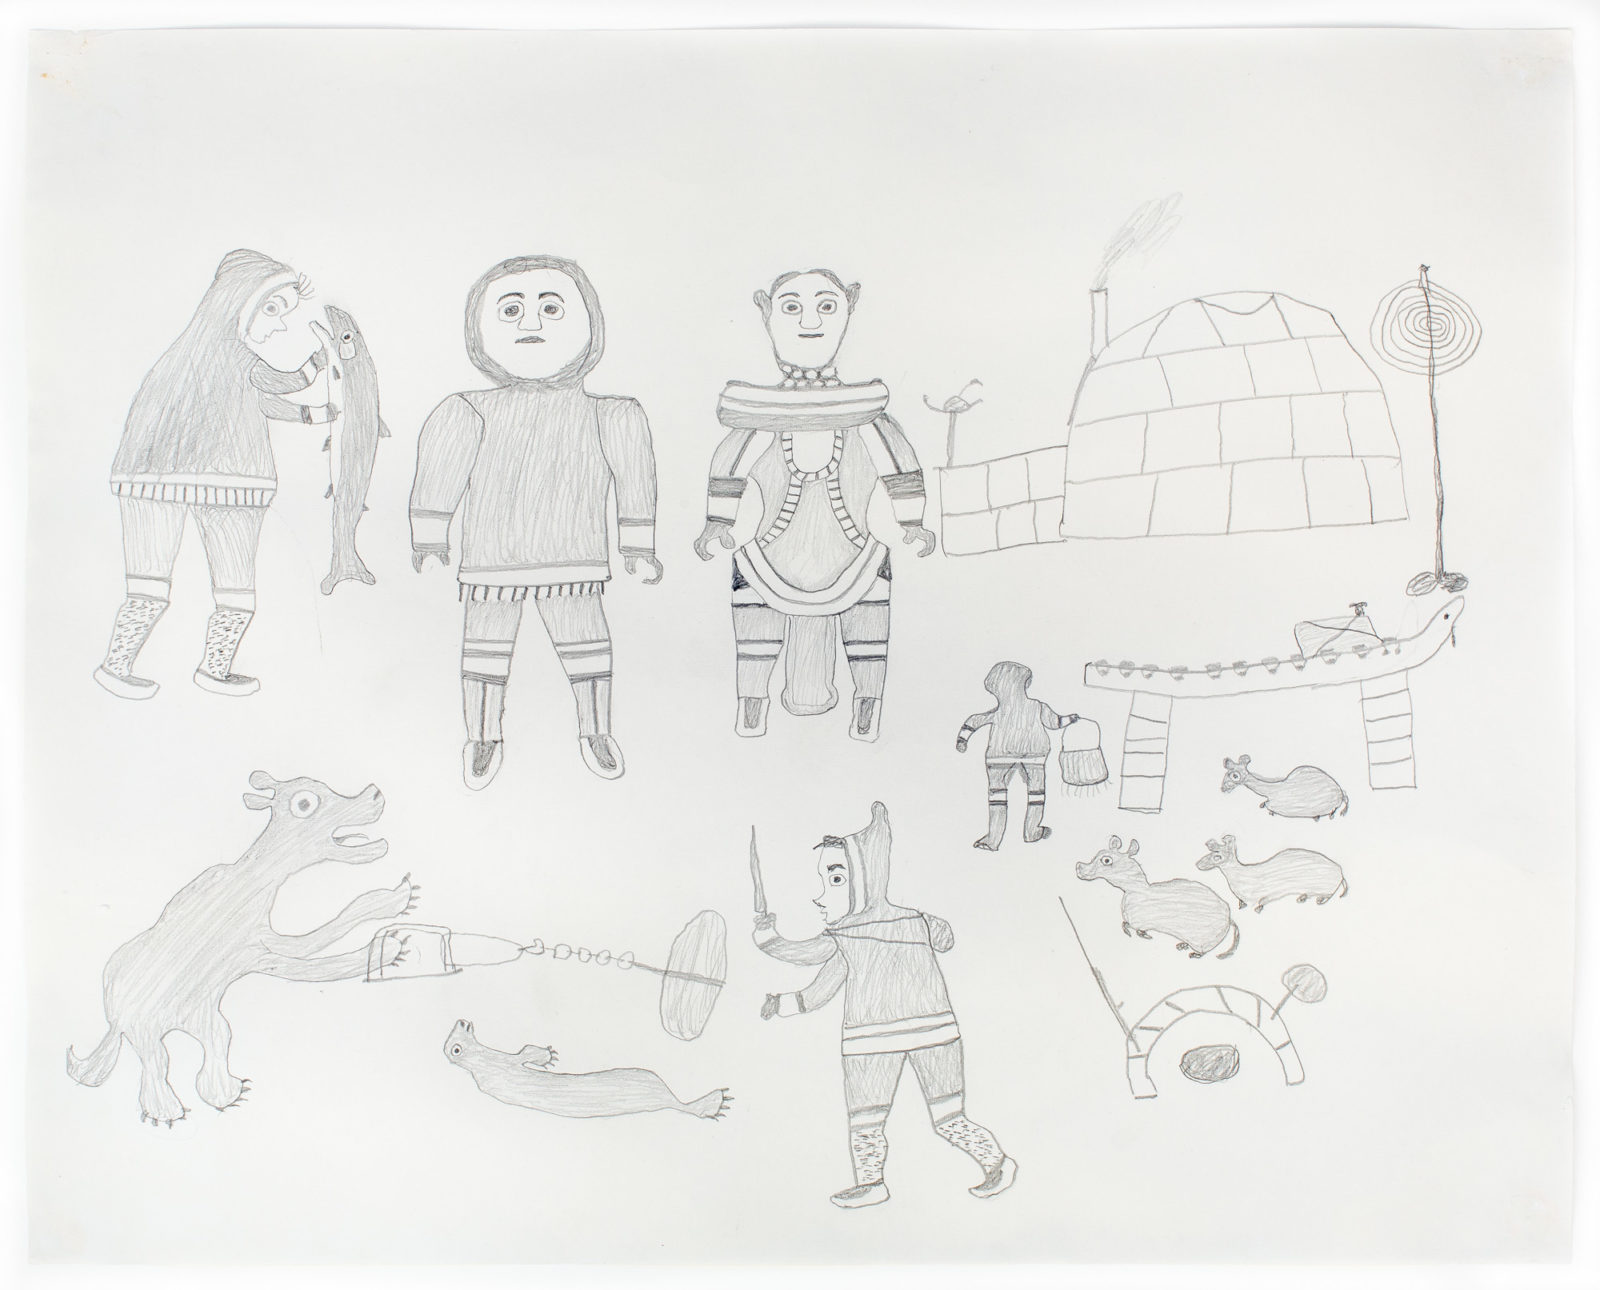 Kiakshuk - untitled (composition)